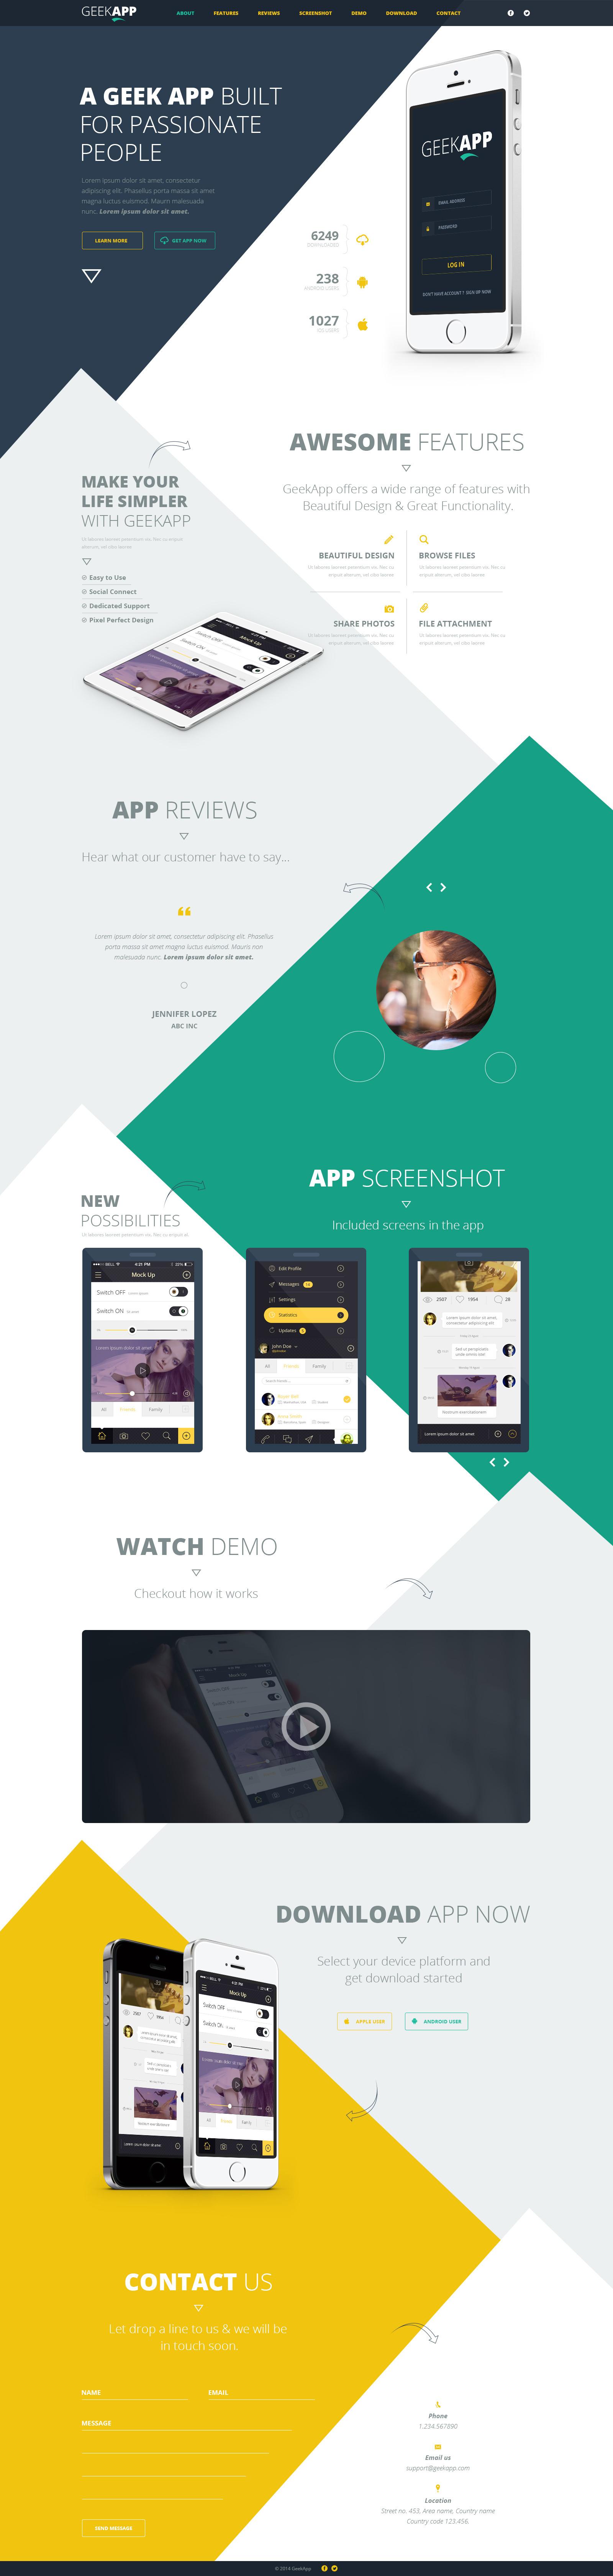 GeekApp - One Page App Landing PSD Template by webduck | ThemeForest